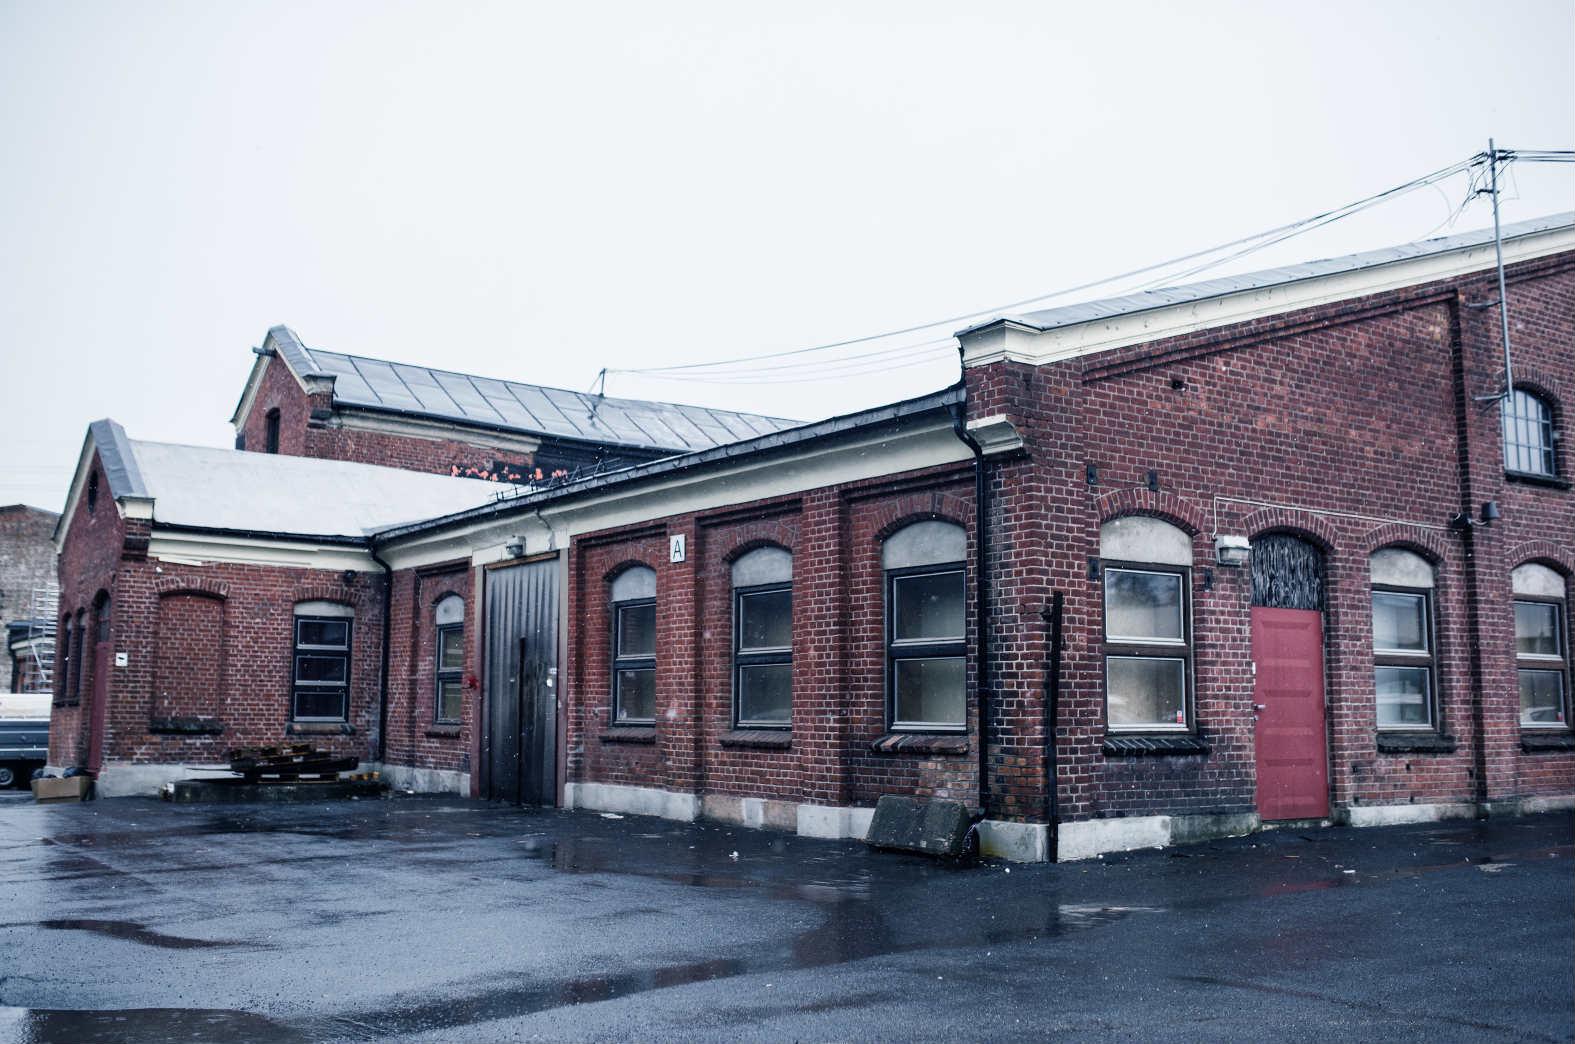 Oslo Håndverksdestilleri destillery building